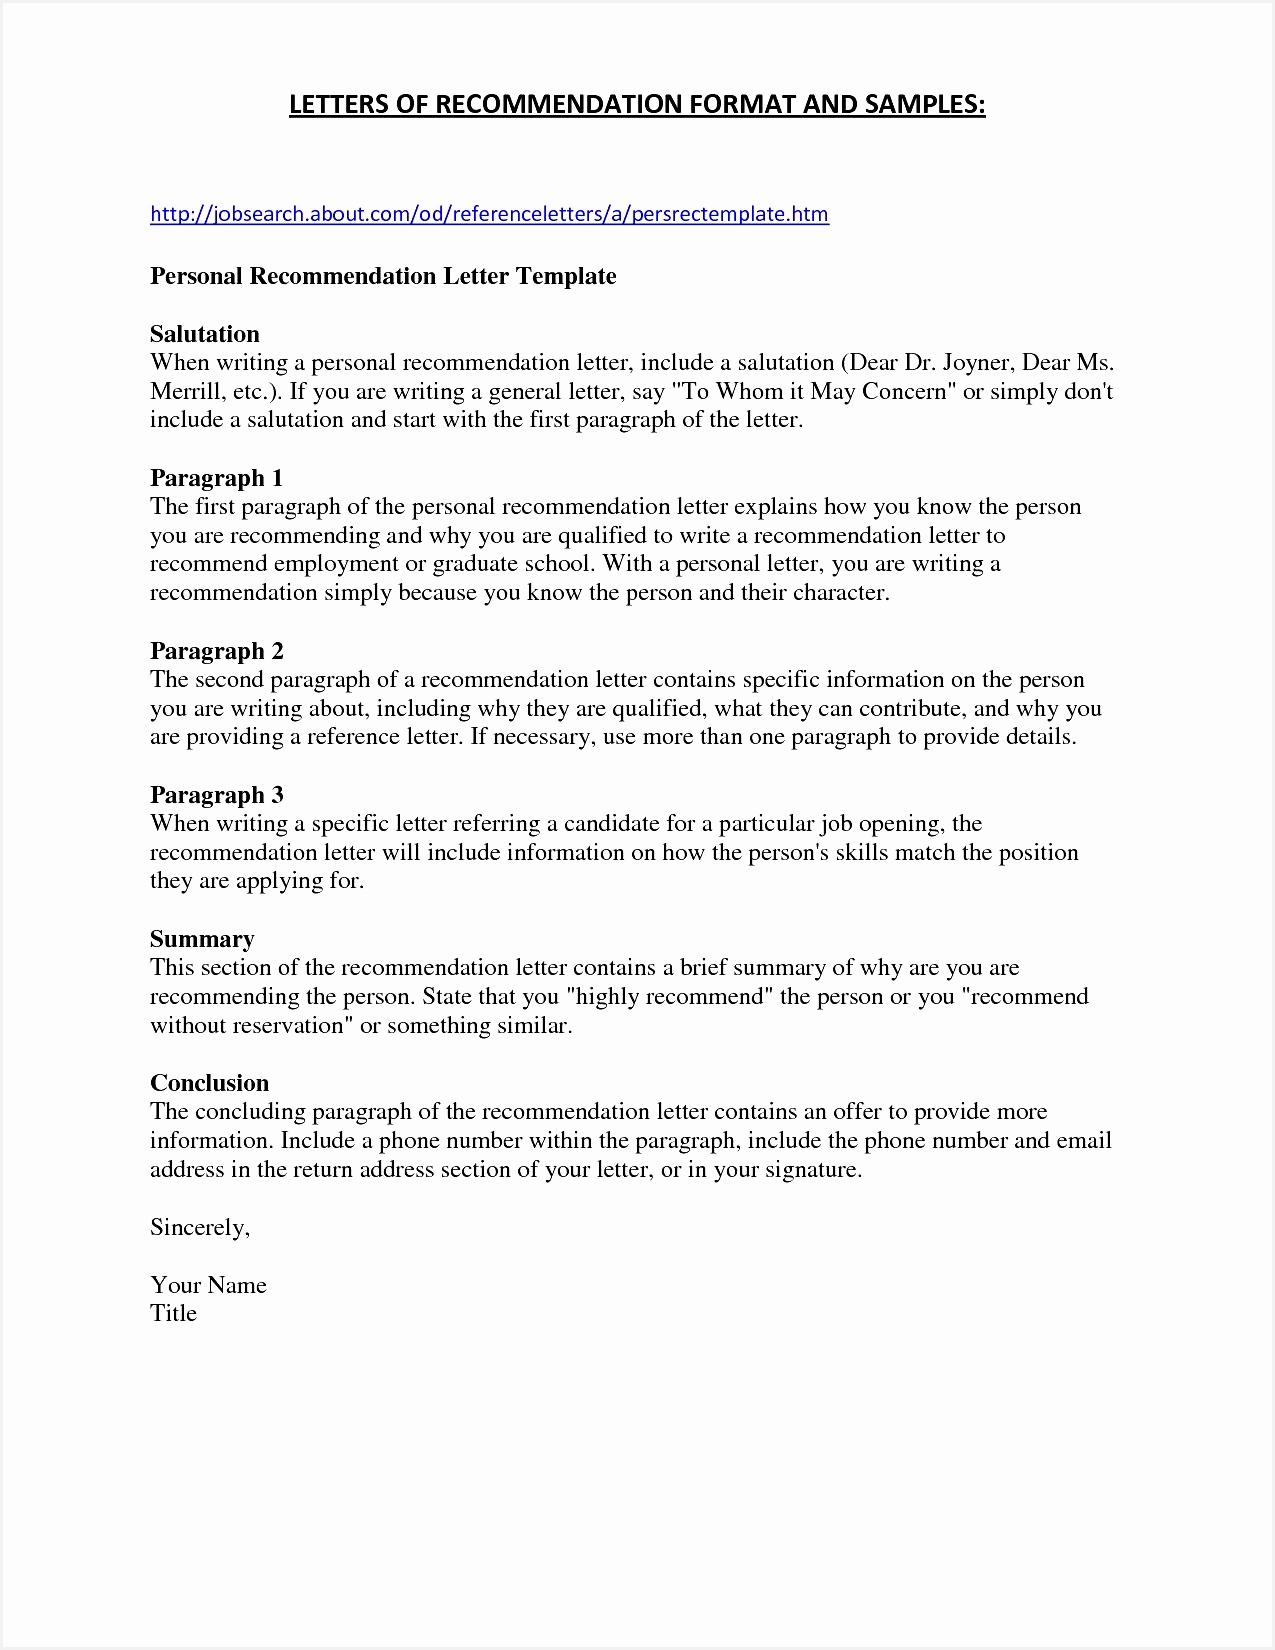 Graduate Resume Template Lovely Resume Sample for Nursing Job Luxury Nursing Resumes 0d Wallpapers16501275